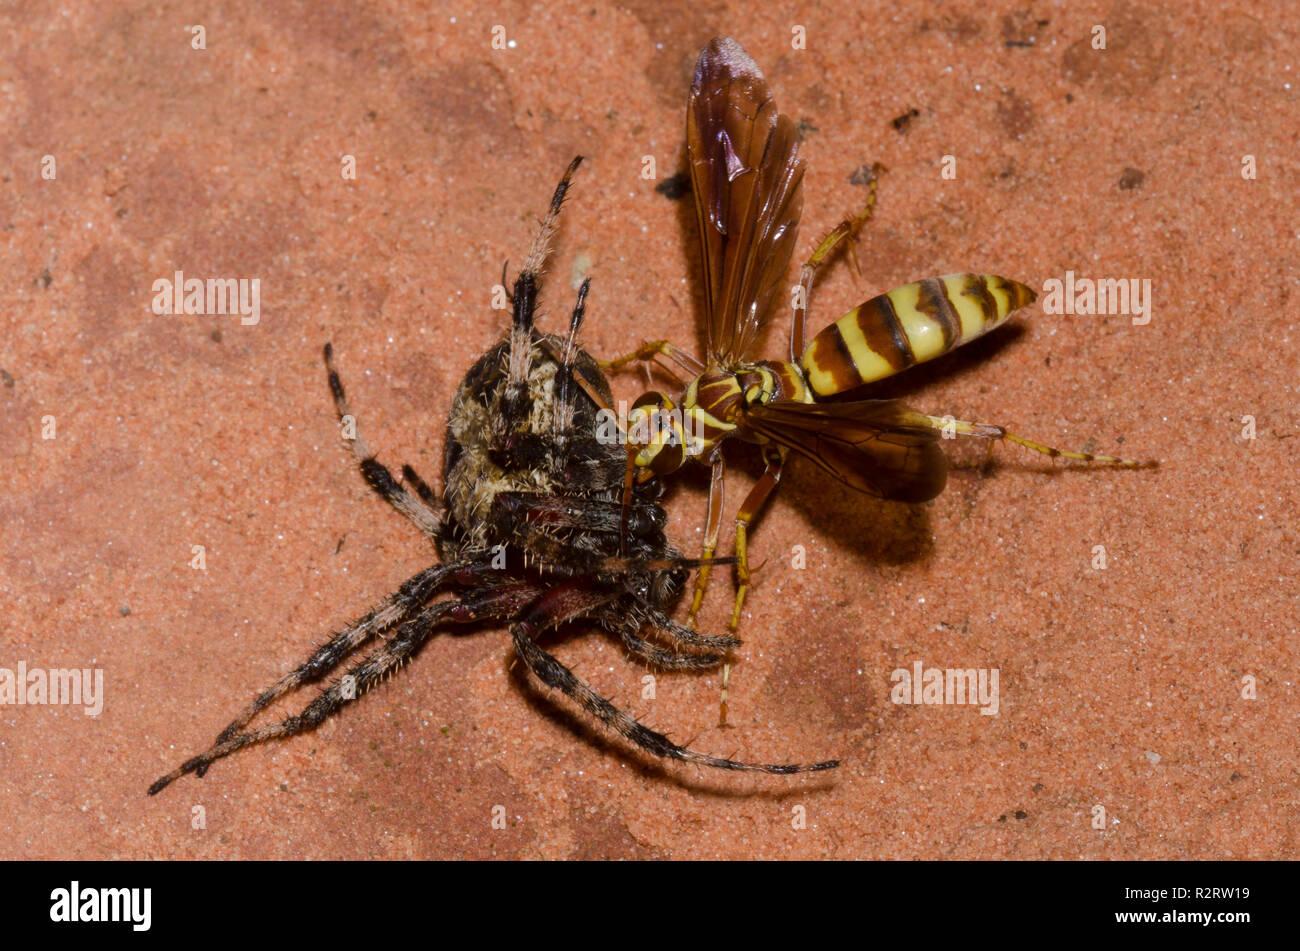 Spider Wasp, Poecilopompilus interruptus, female dragging paralyzed Spotted Orb Weaver, Neoscona crucifera, adult female prey - Stock Image